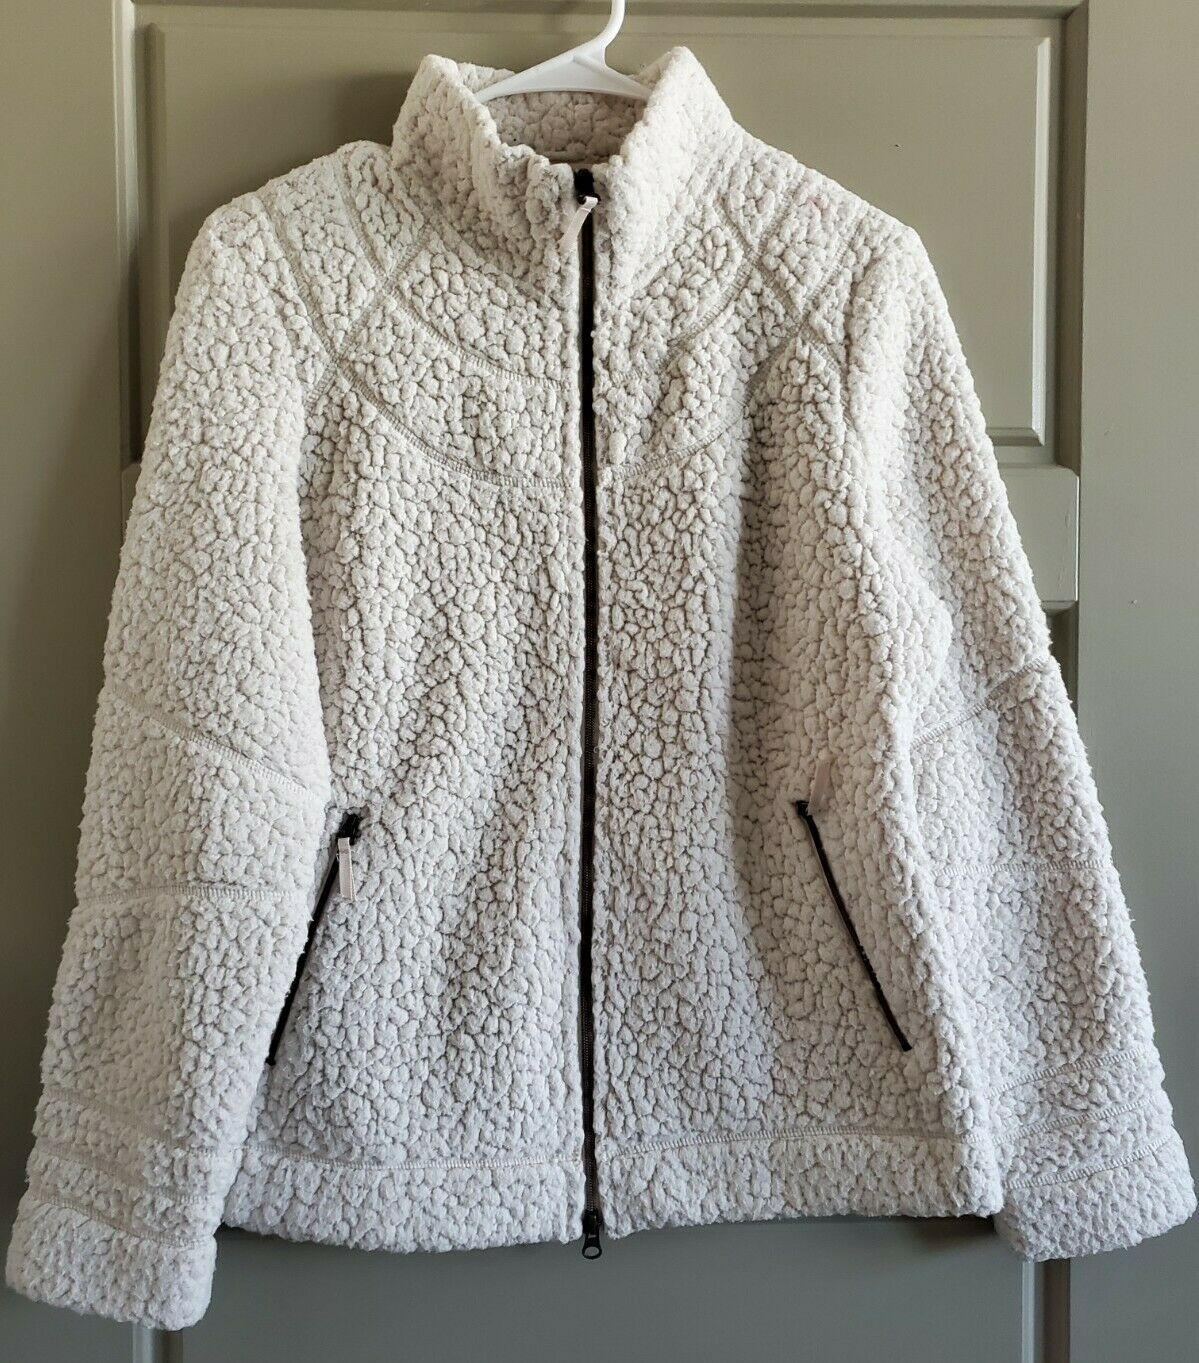 Royal Robbins Women's Deep Pile Snow Wonder Fleece Jacket Ivory Size Large Soft!